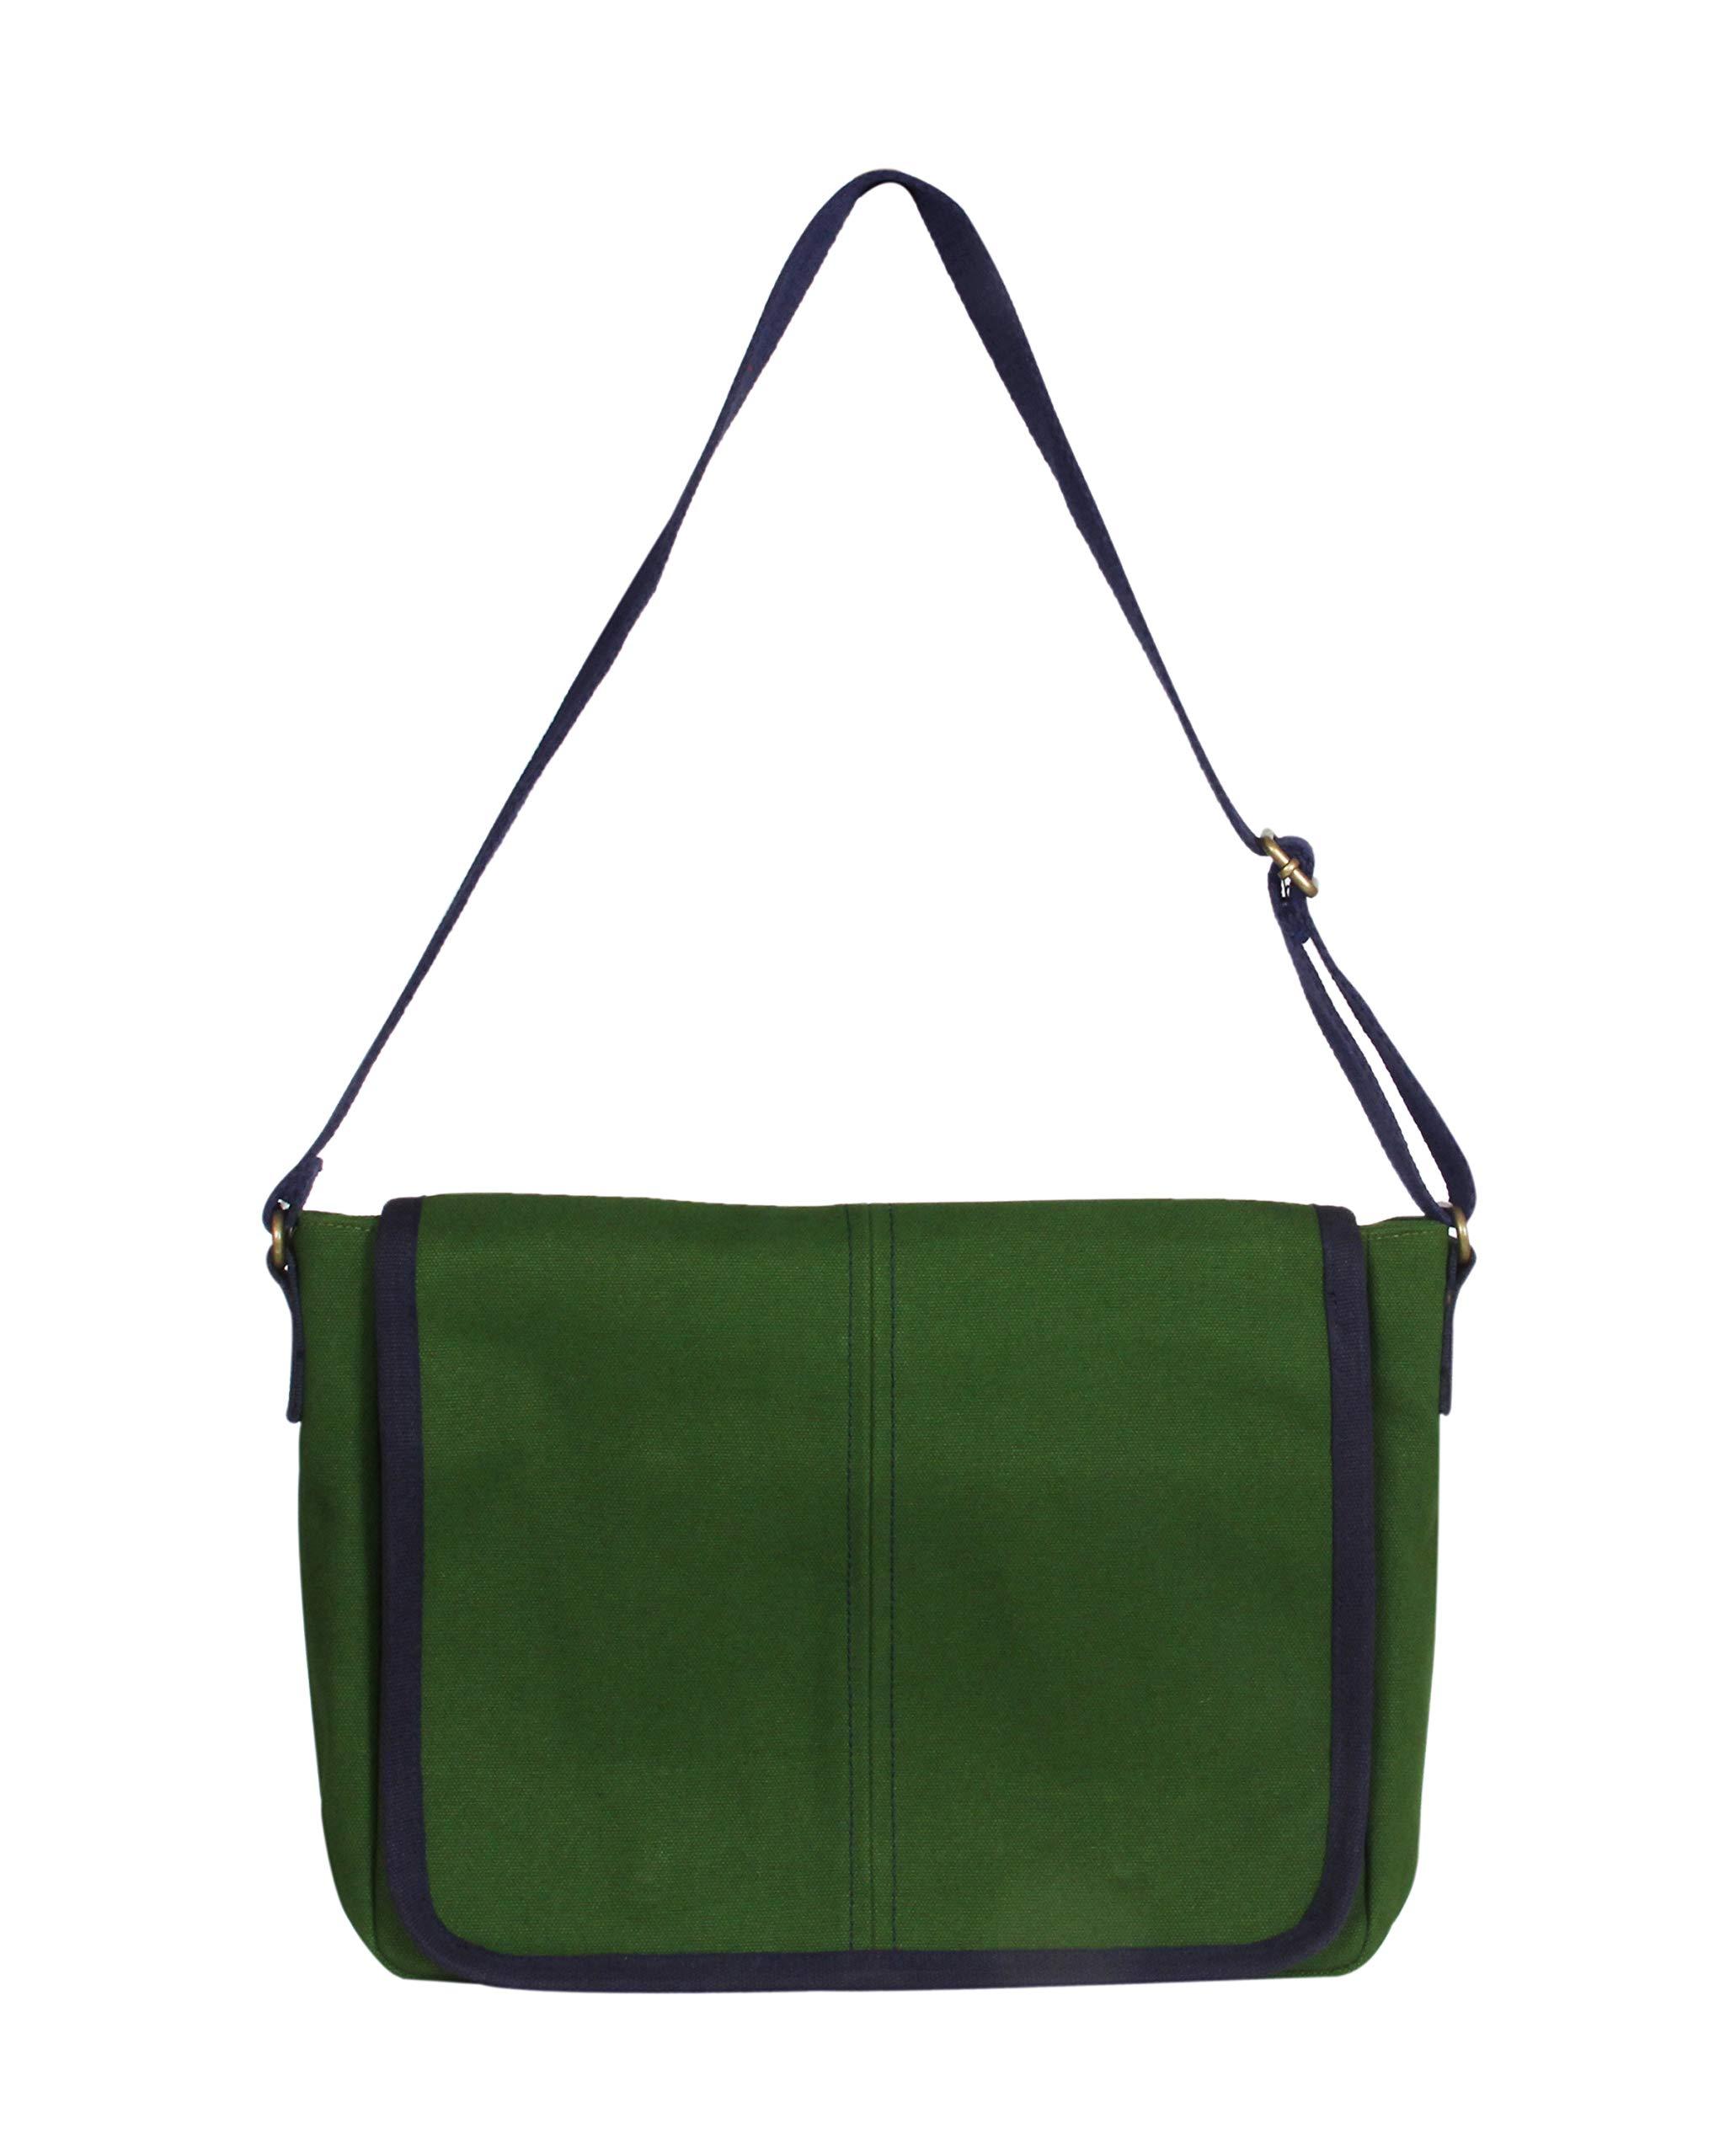 EcoRight Messenger Bag - Canvas 100% EcoFriendly Shoulder Bag for Men, Laptop Travel Bag - Army Green